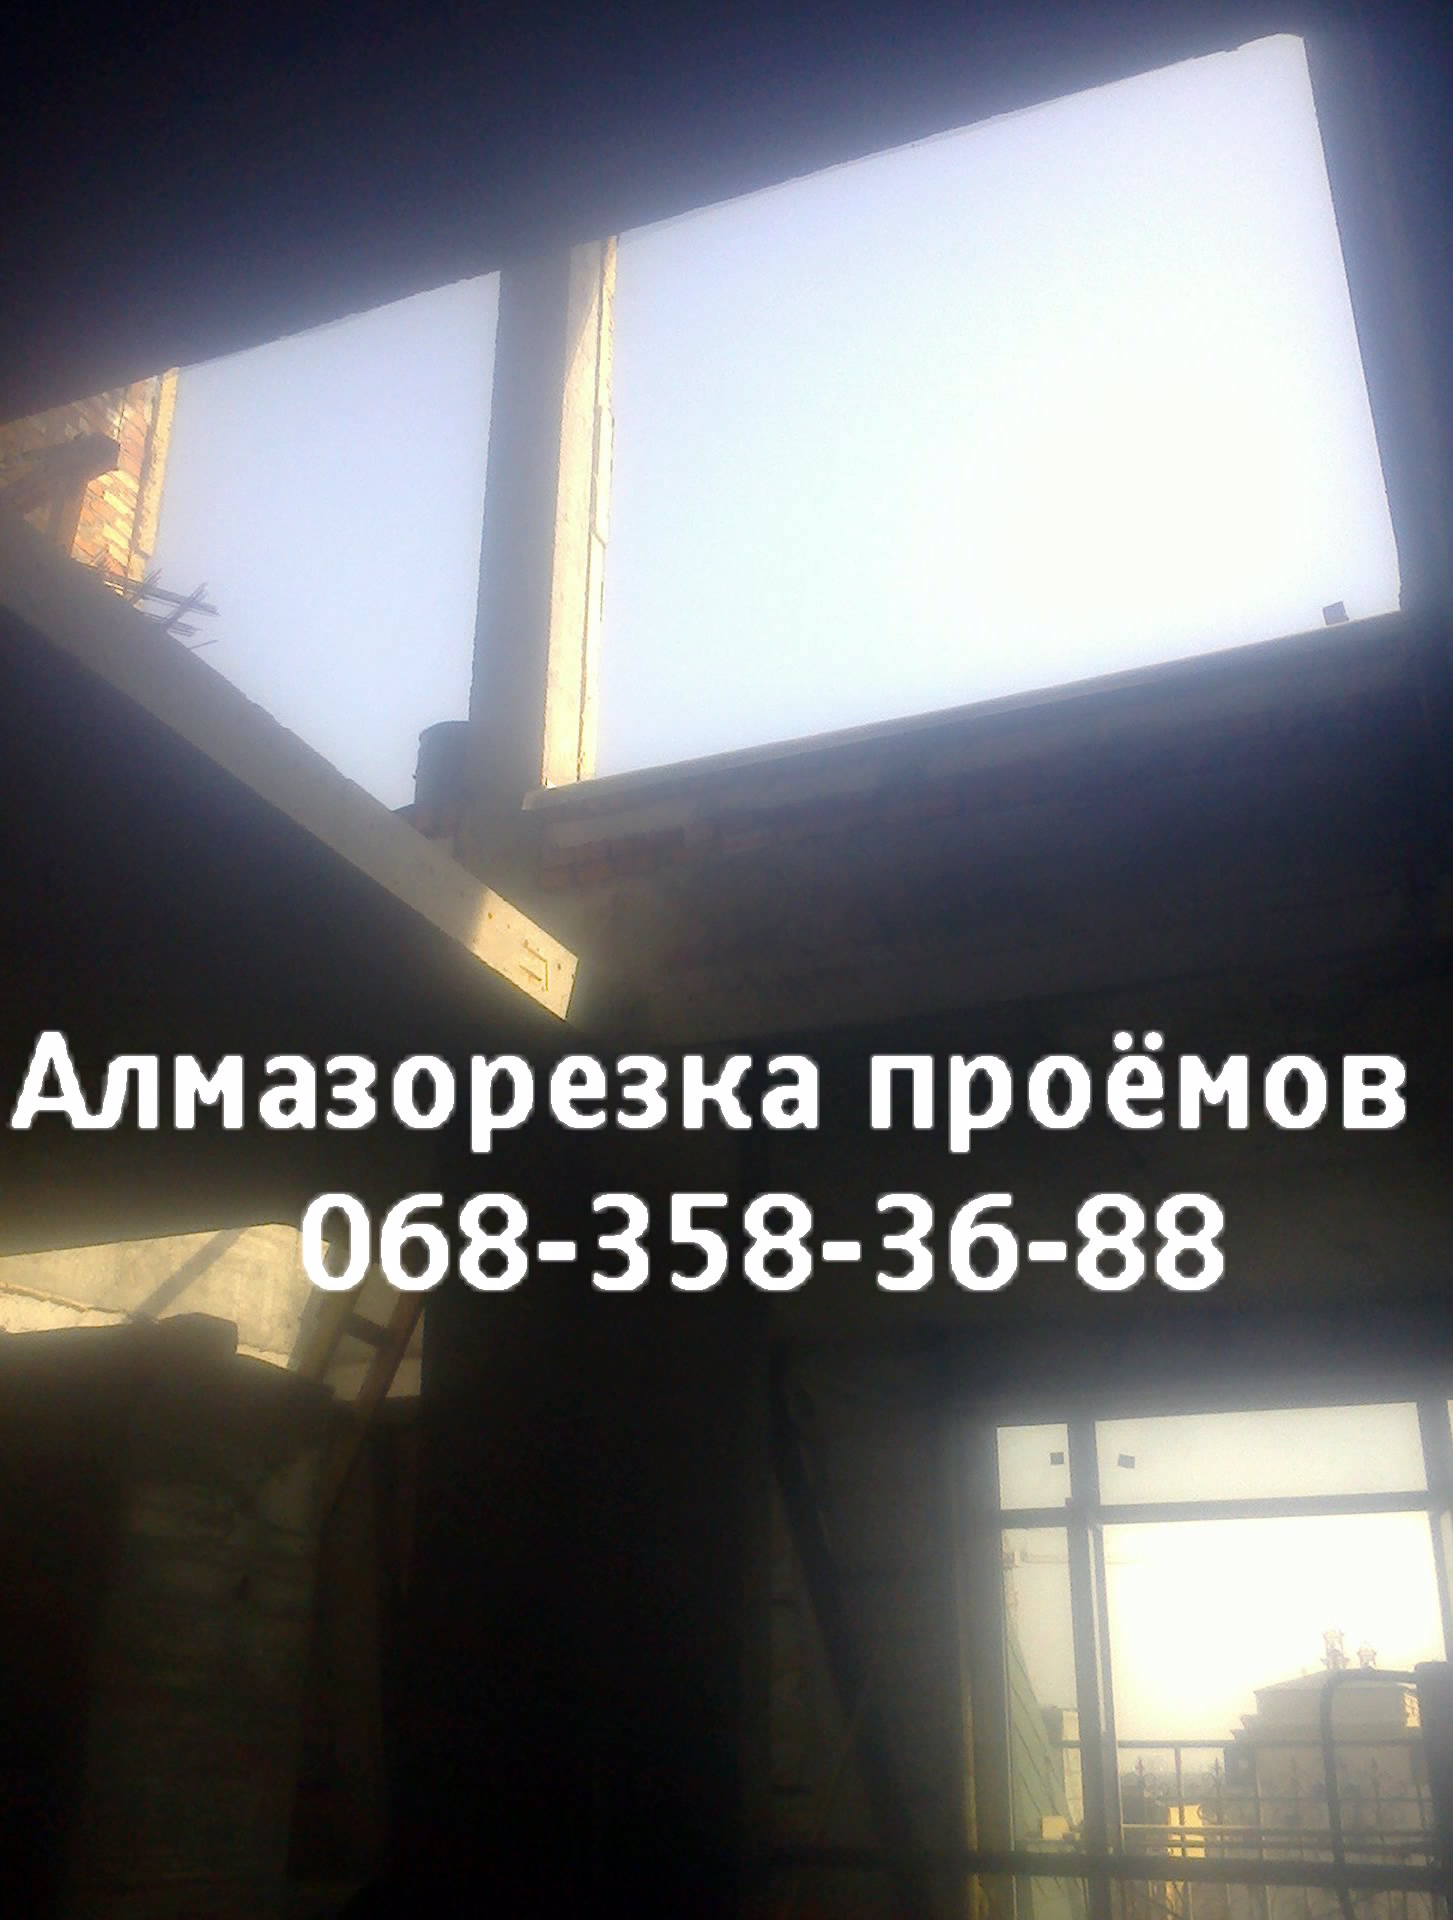 Нажмите на изображение для увеличения Название: Фото0603.jpg Просмотров: 10 Размер:216.7 Кб ID:595172